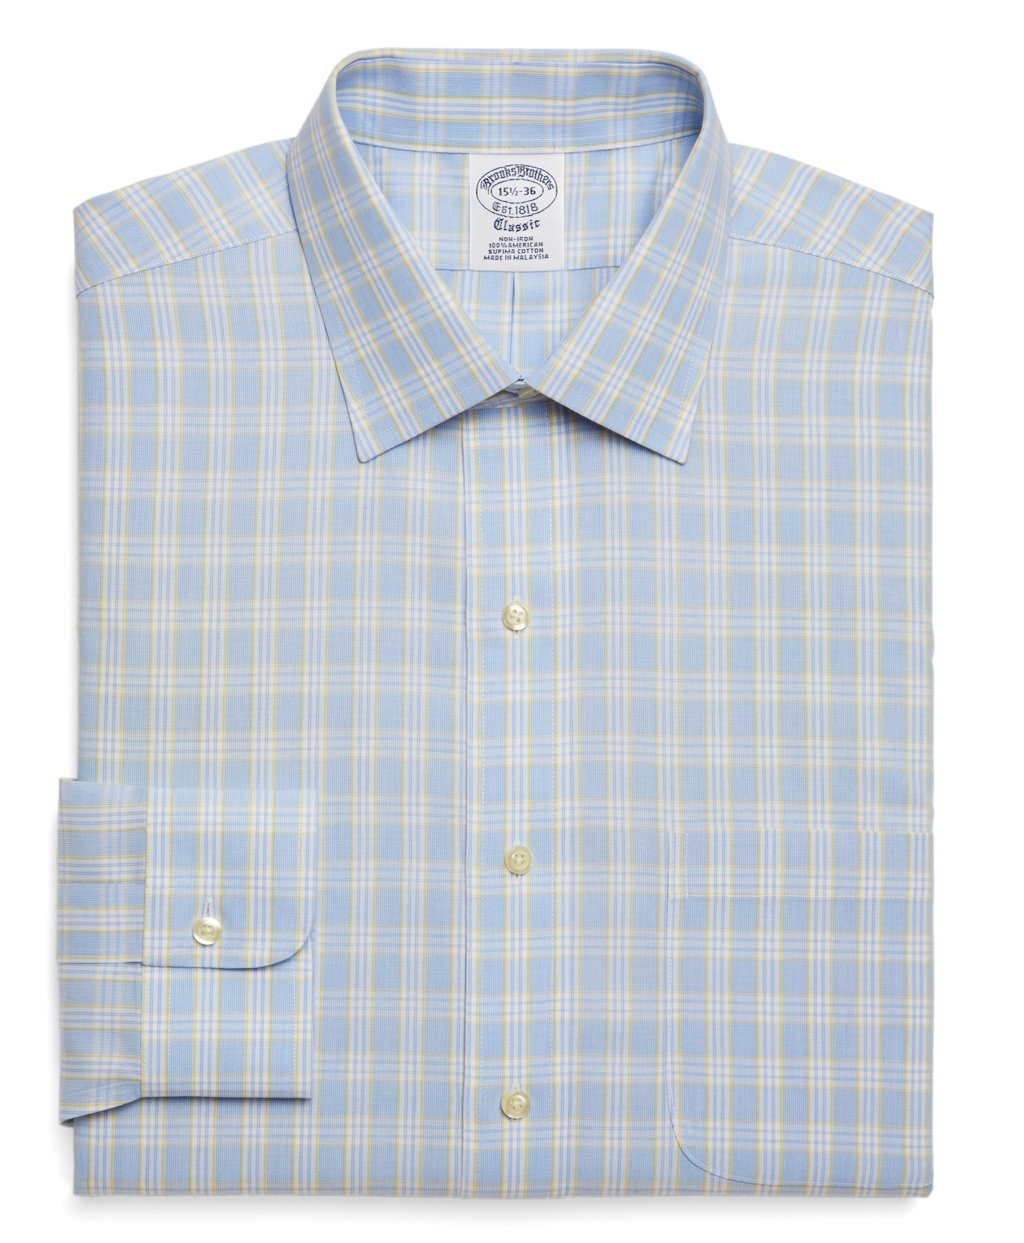 7ef74f15f4c9 Brooks Brothers Supima Cotton Noniron Slim Fit Glen Plaid Dress ...